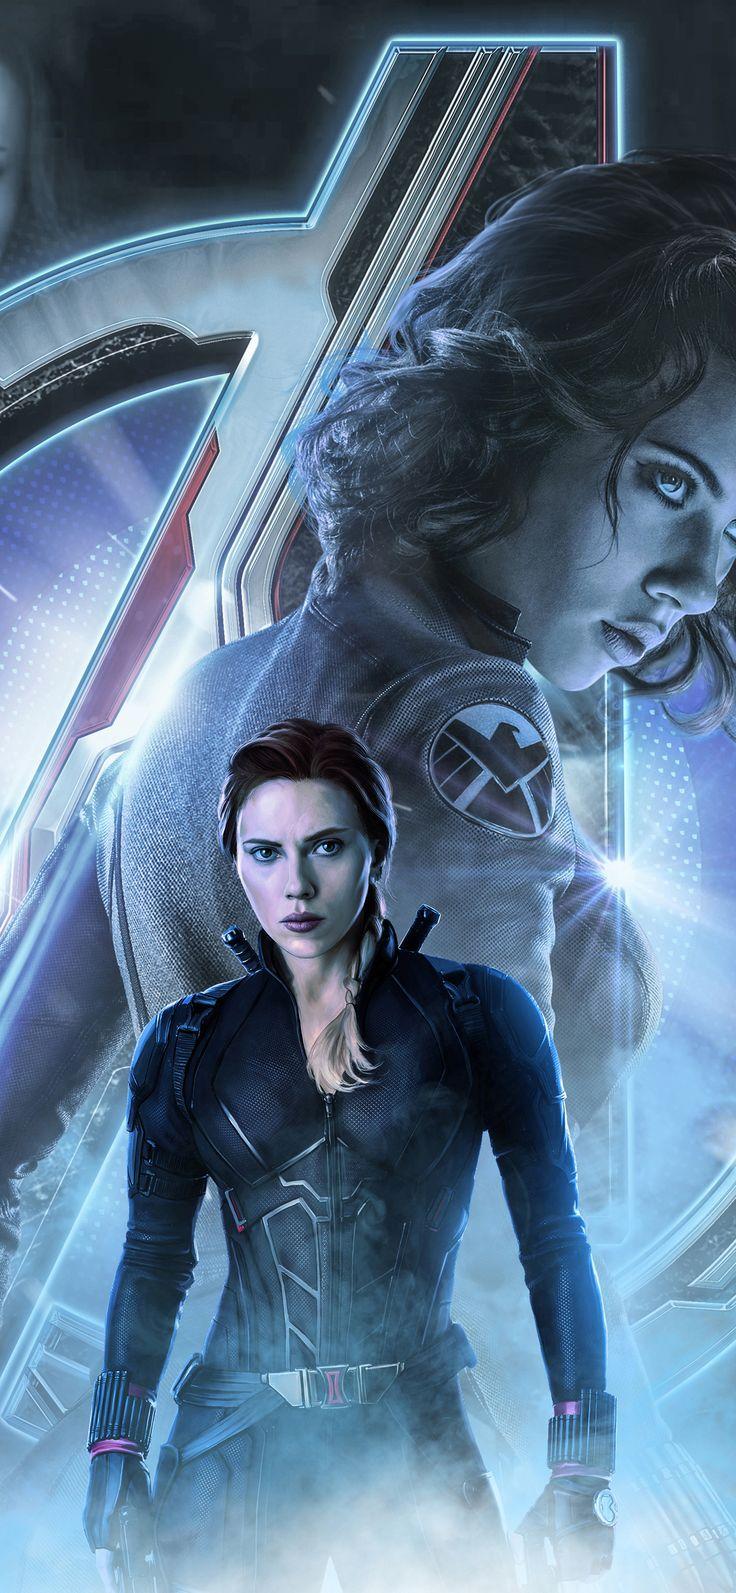 1125x2436 Black Widow In Avengers Endgame 2019 Iphone XS ...